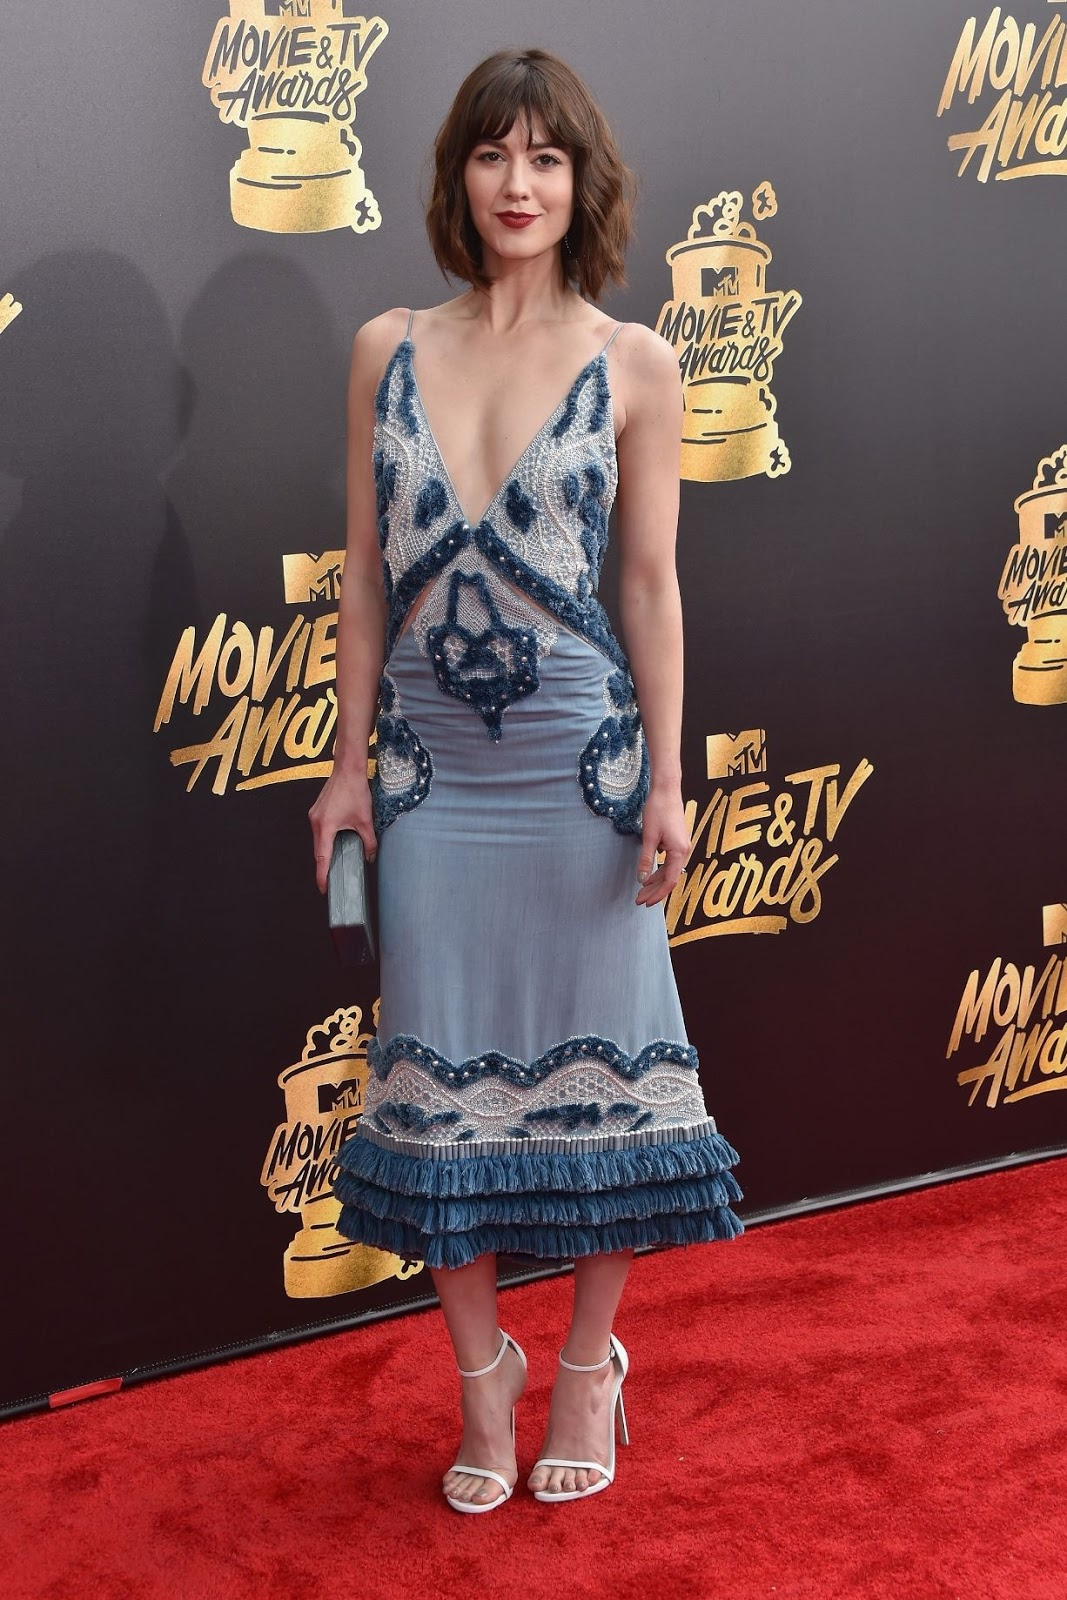 mtv movie awards 2017 mary elizabeth winstead